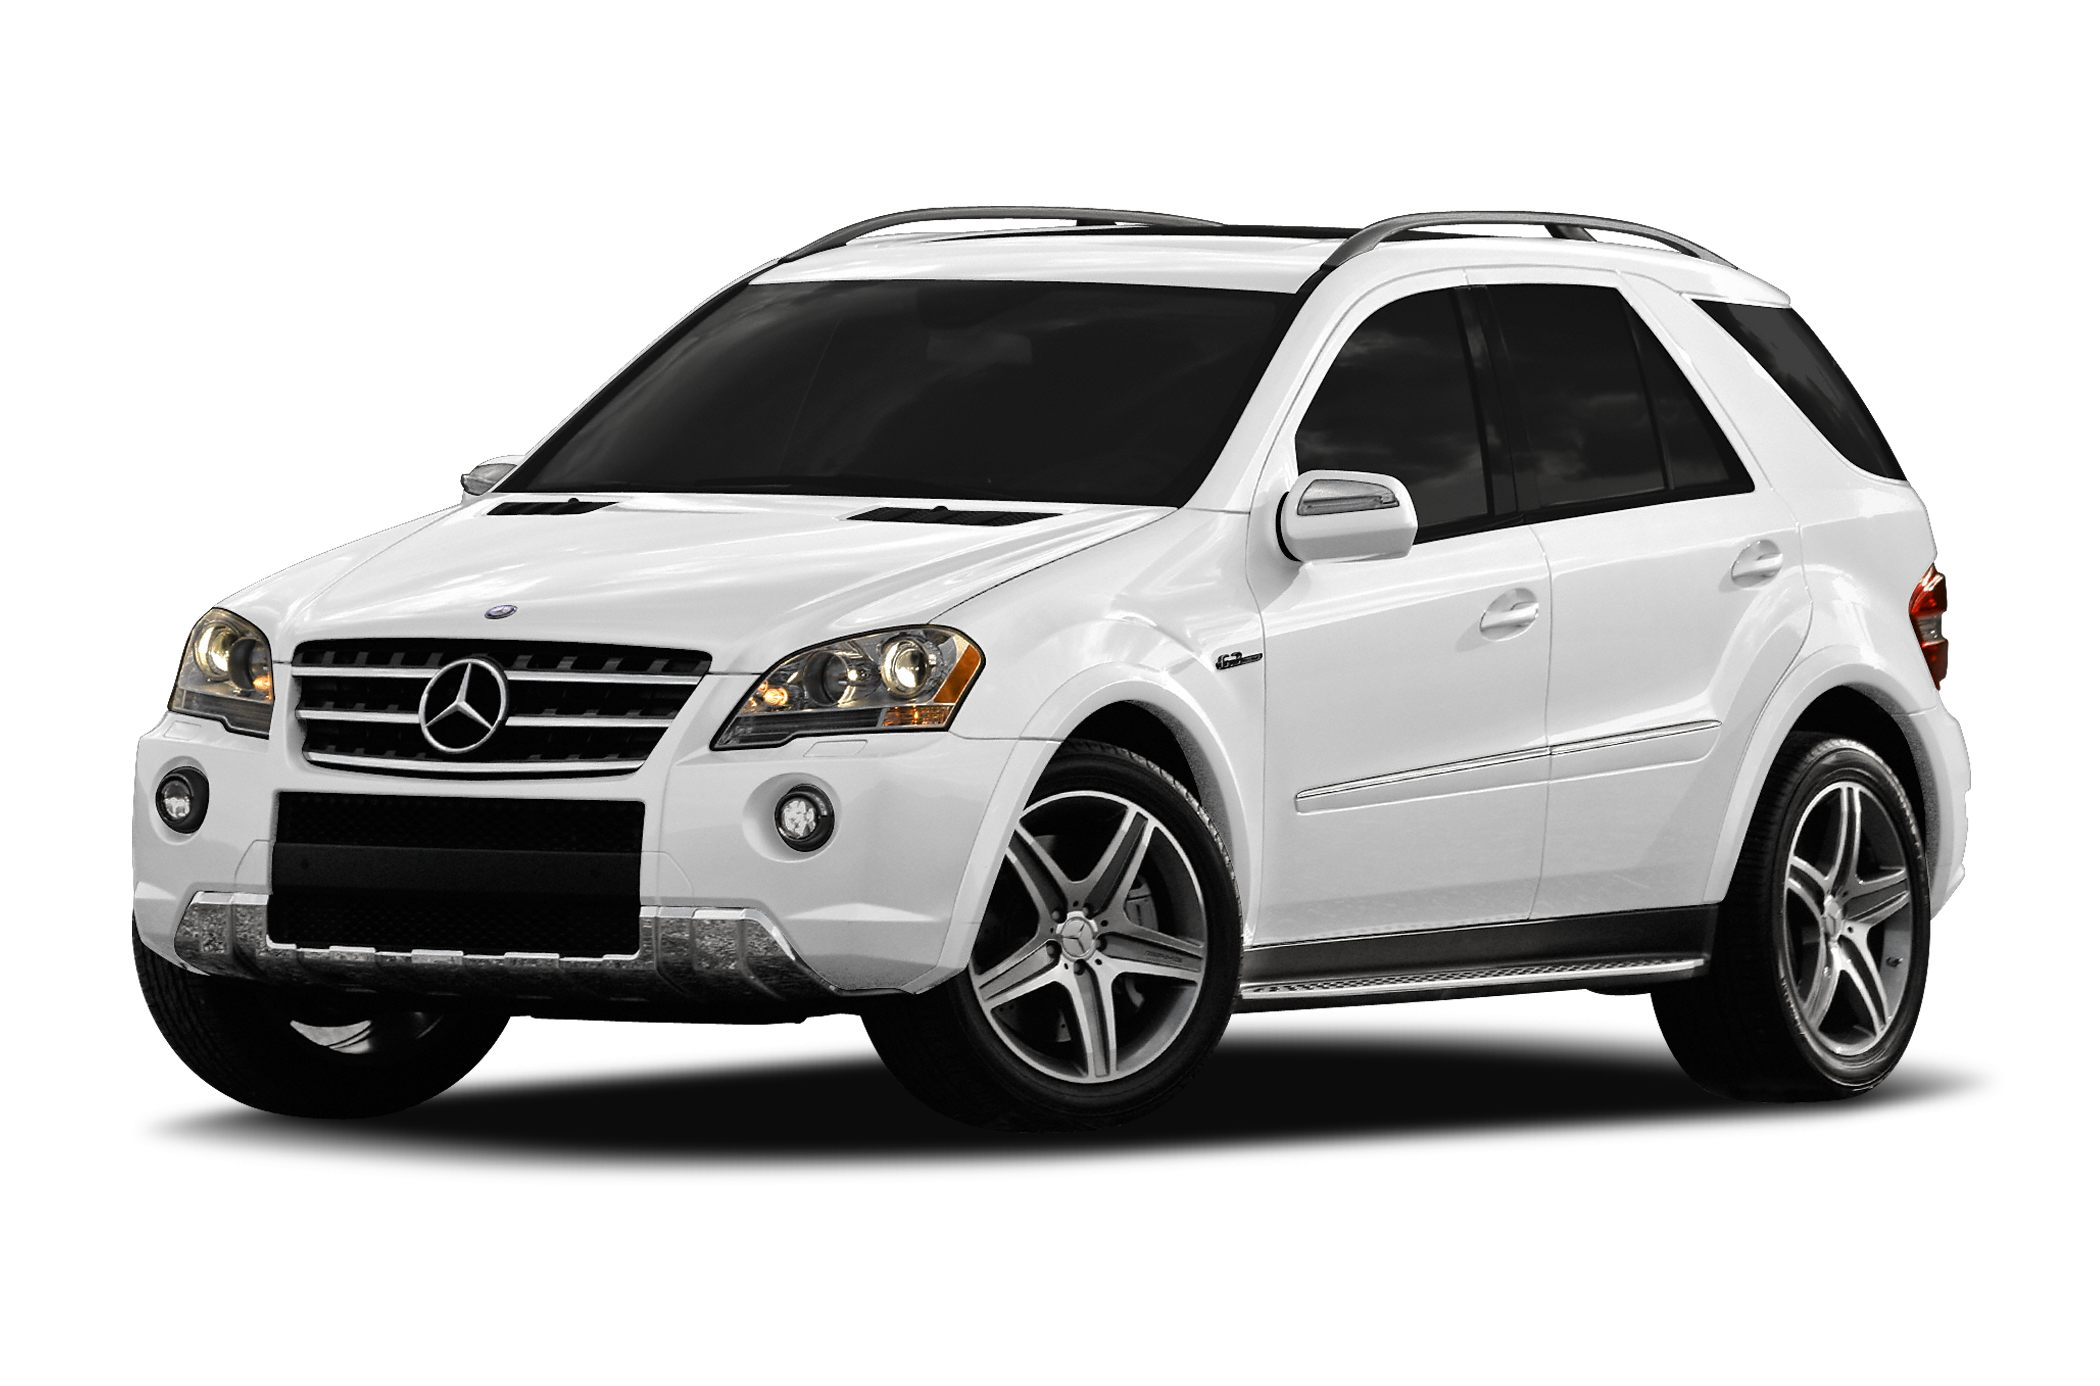 2009 Mercedes Benz M Class Base ML 63 AMG 4dr All wheel Drive 4MATIC